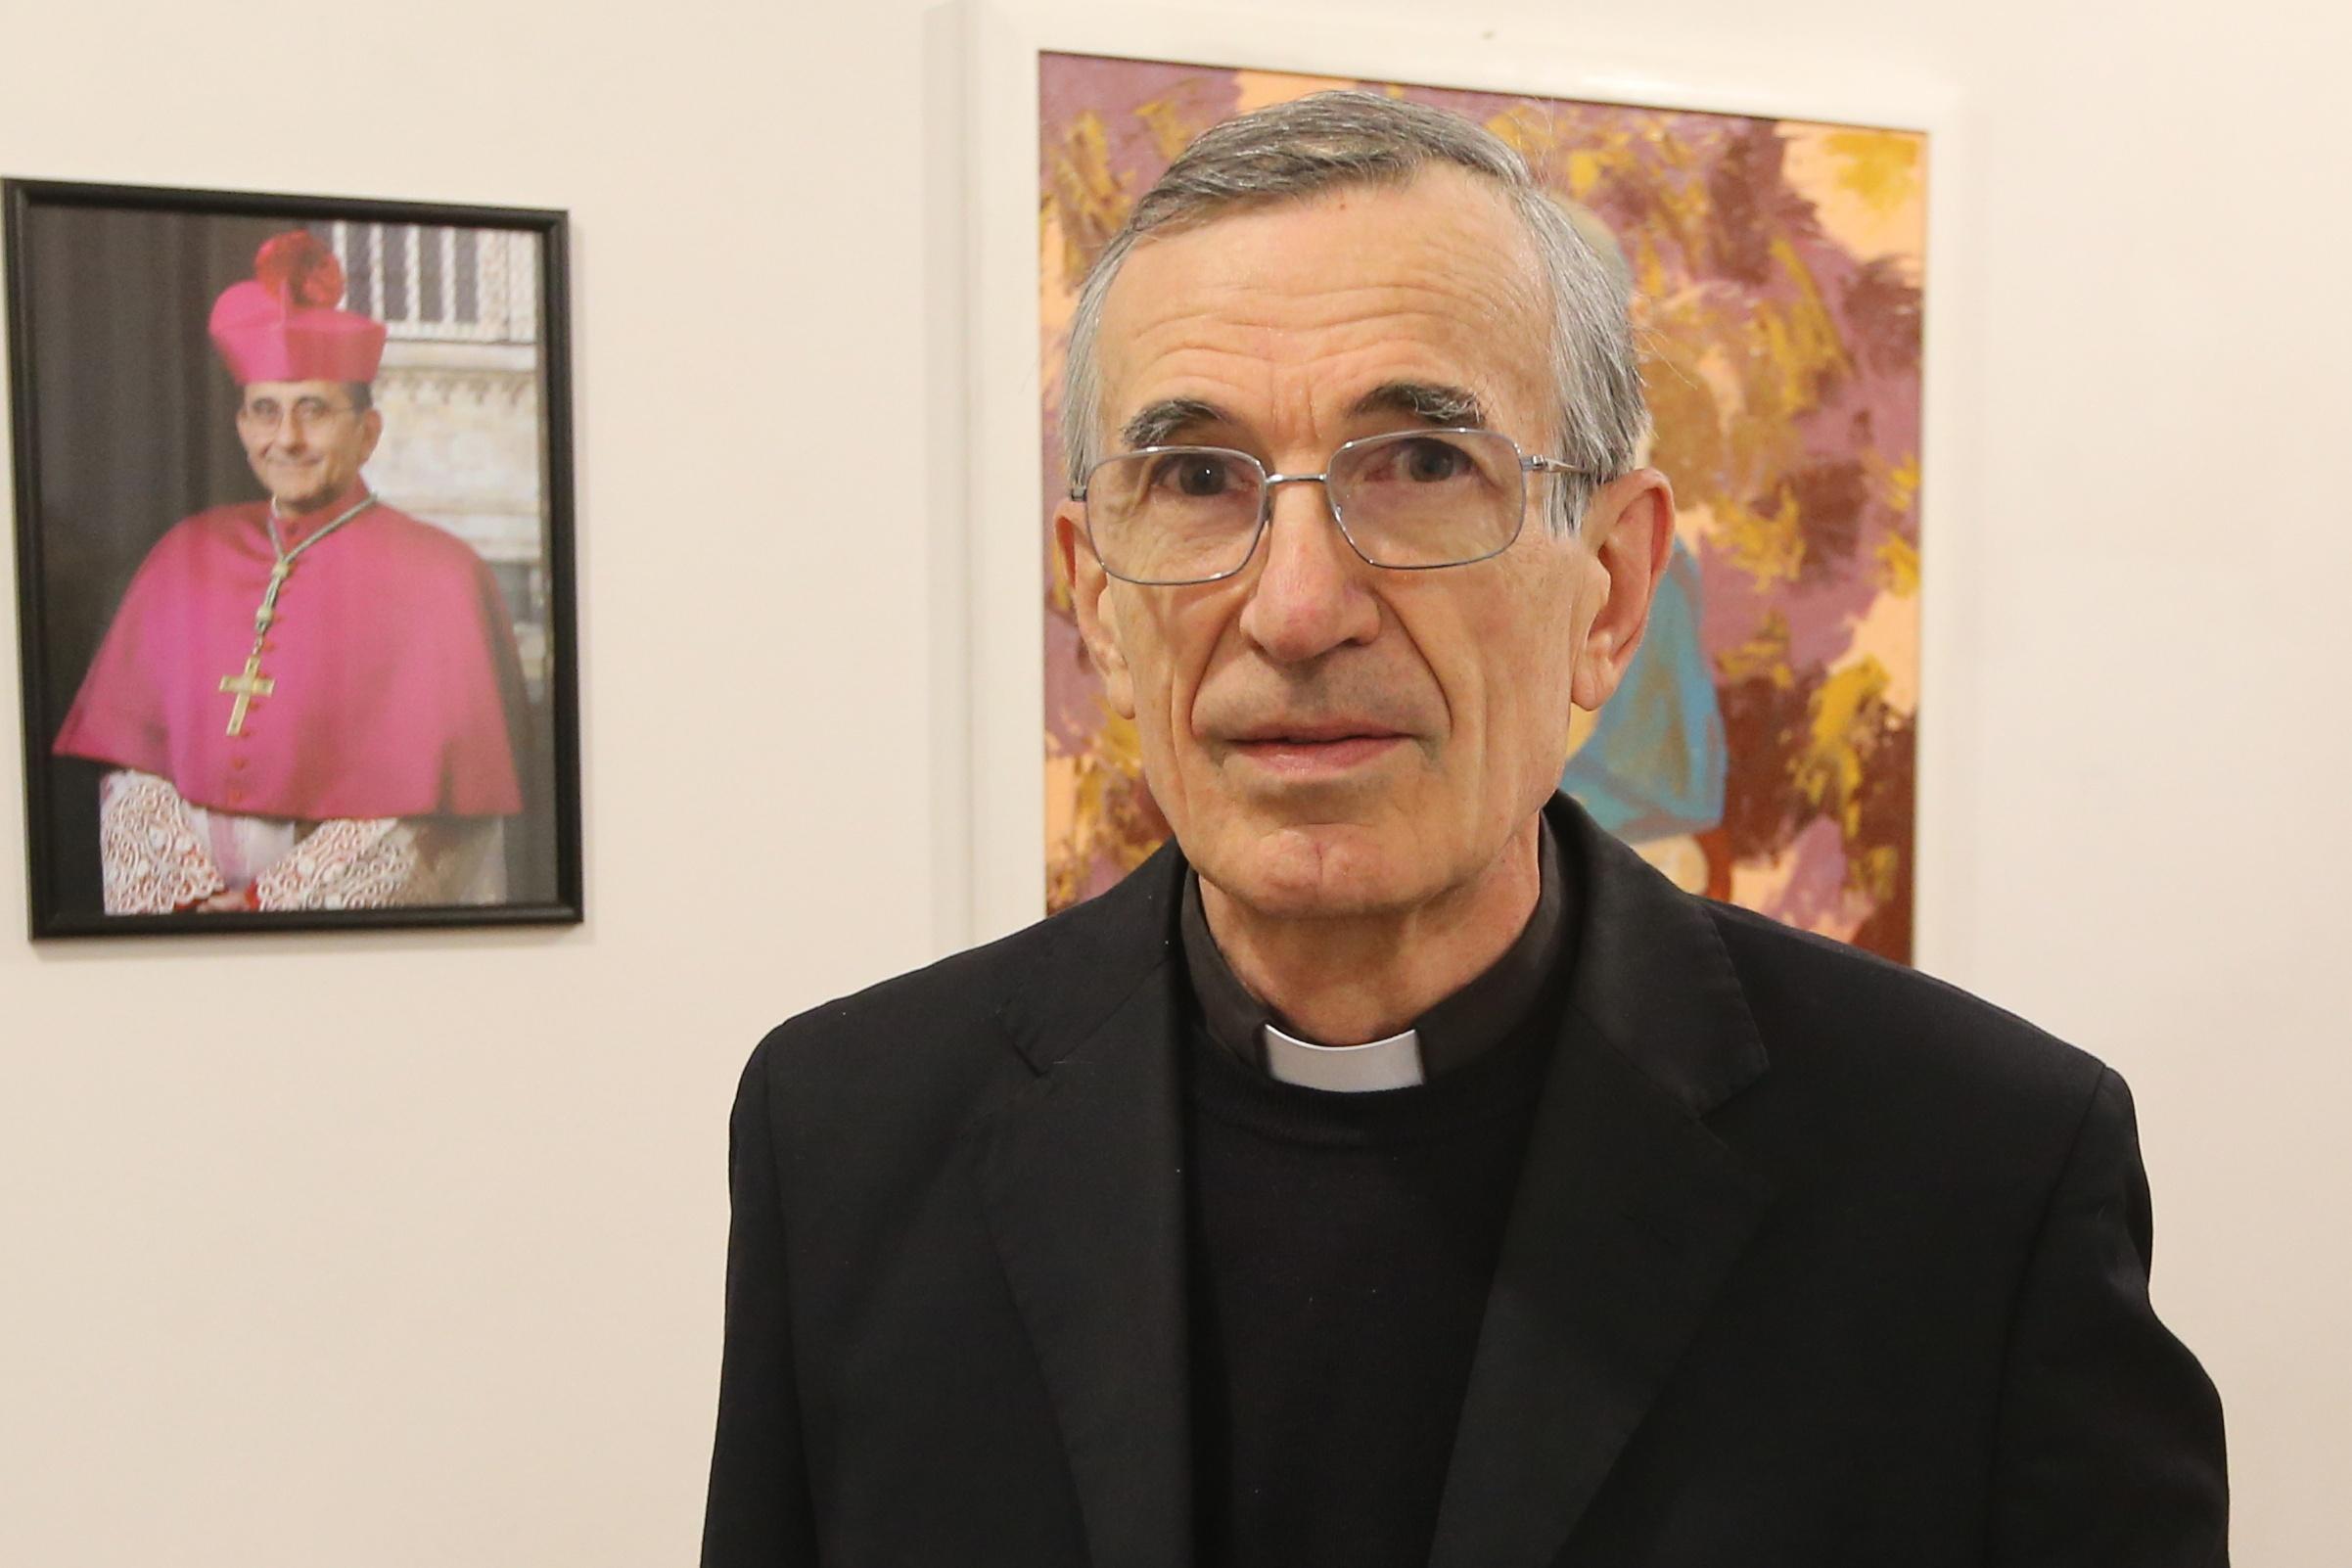 Don Roberto Colombo